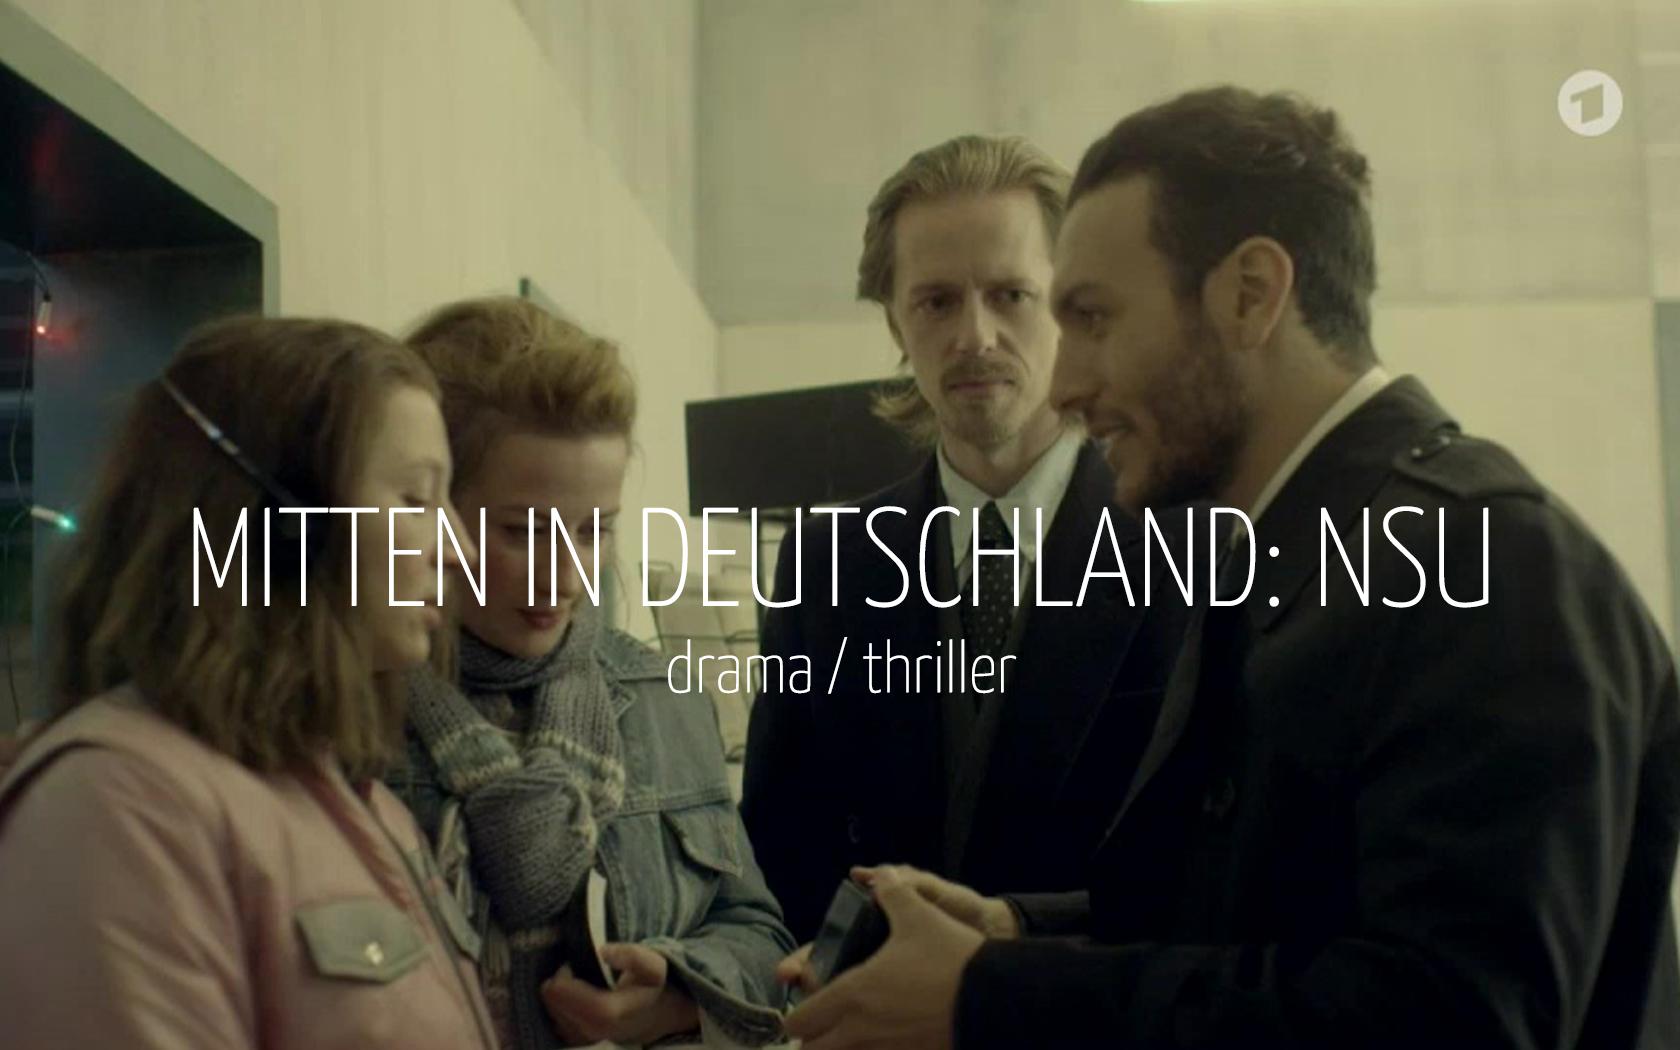 Scandinavian actor Fredrik Wagner as scientologist in drama film Mitten in Deutchland: NSU with Anna Maria Mühe, Nina Gummich and Angus McGruther